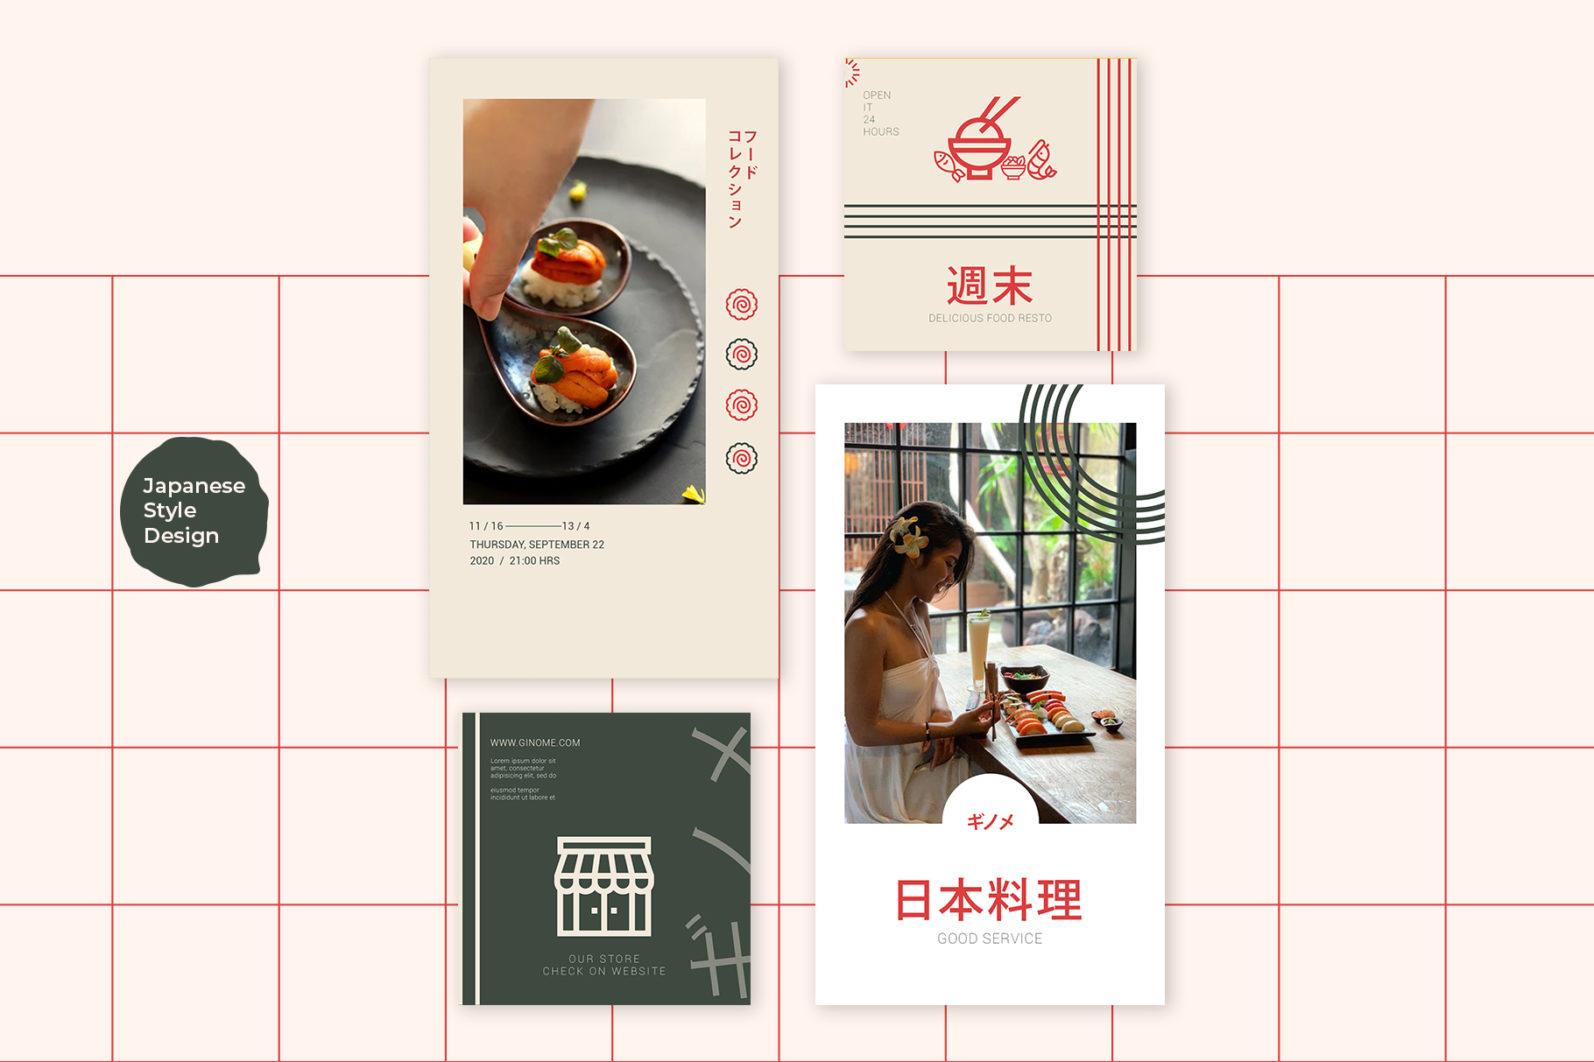 Japan Food Instagram Templates - new mockupp9 copy 2 -